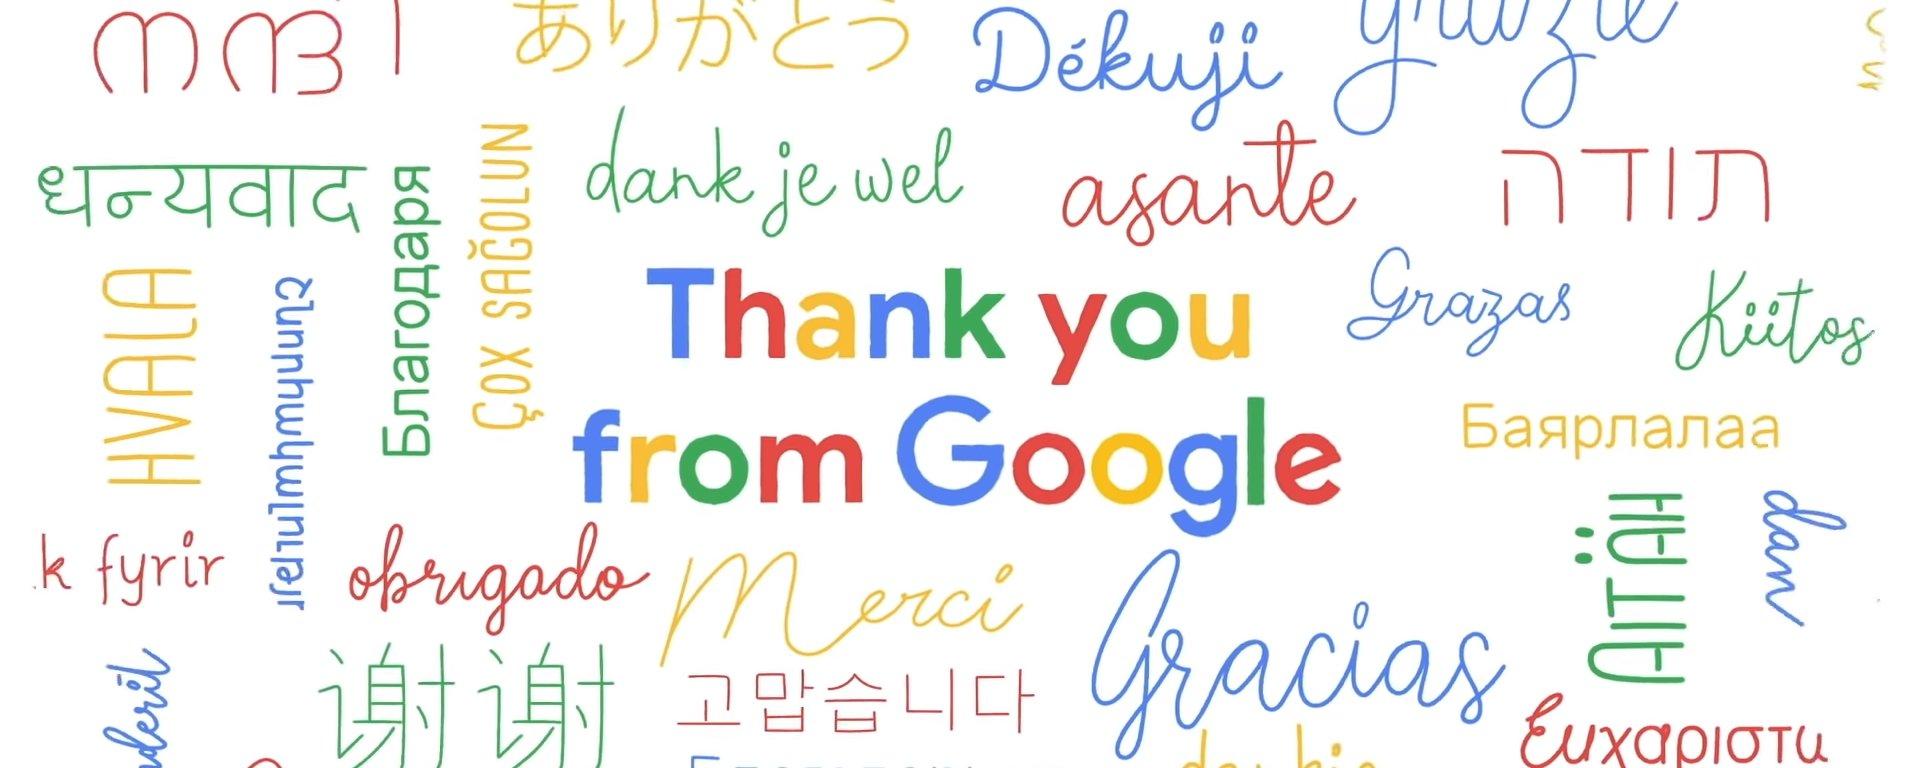 Ferramenta de busca da Google completa 20 anos e ganha Doodle especial